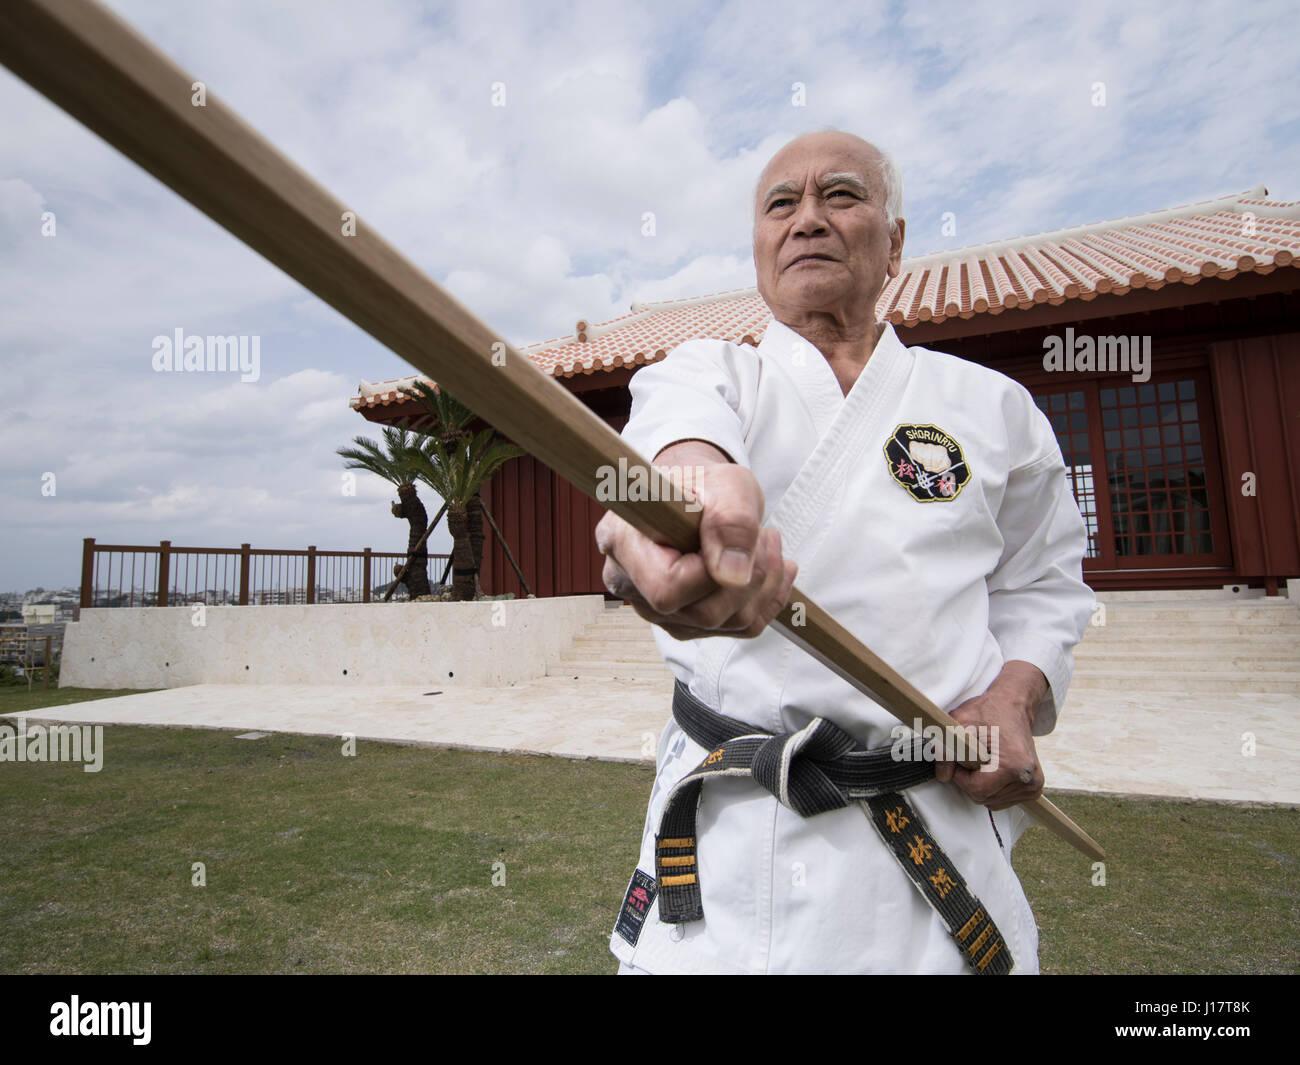 Maître Arakaki karaté sensei au 100 cas en karaté kata Kobudo Kaikan, Okinawa, Japon Banque D'Images